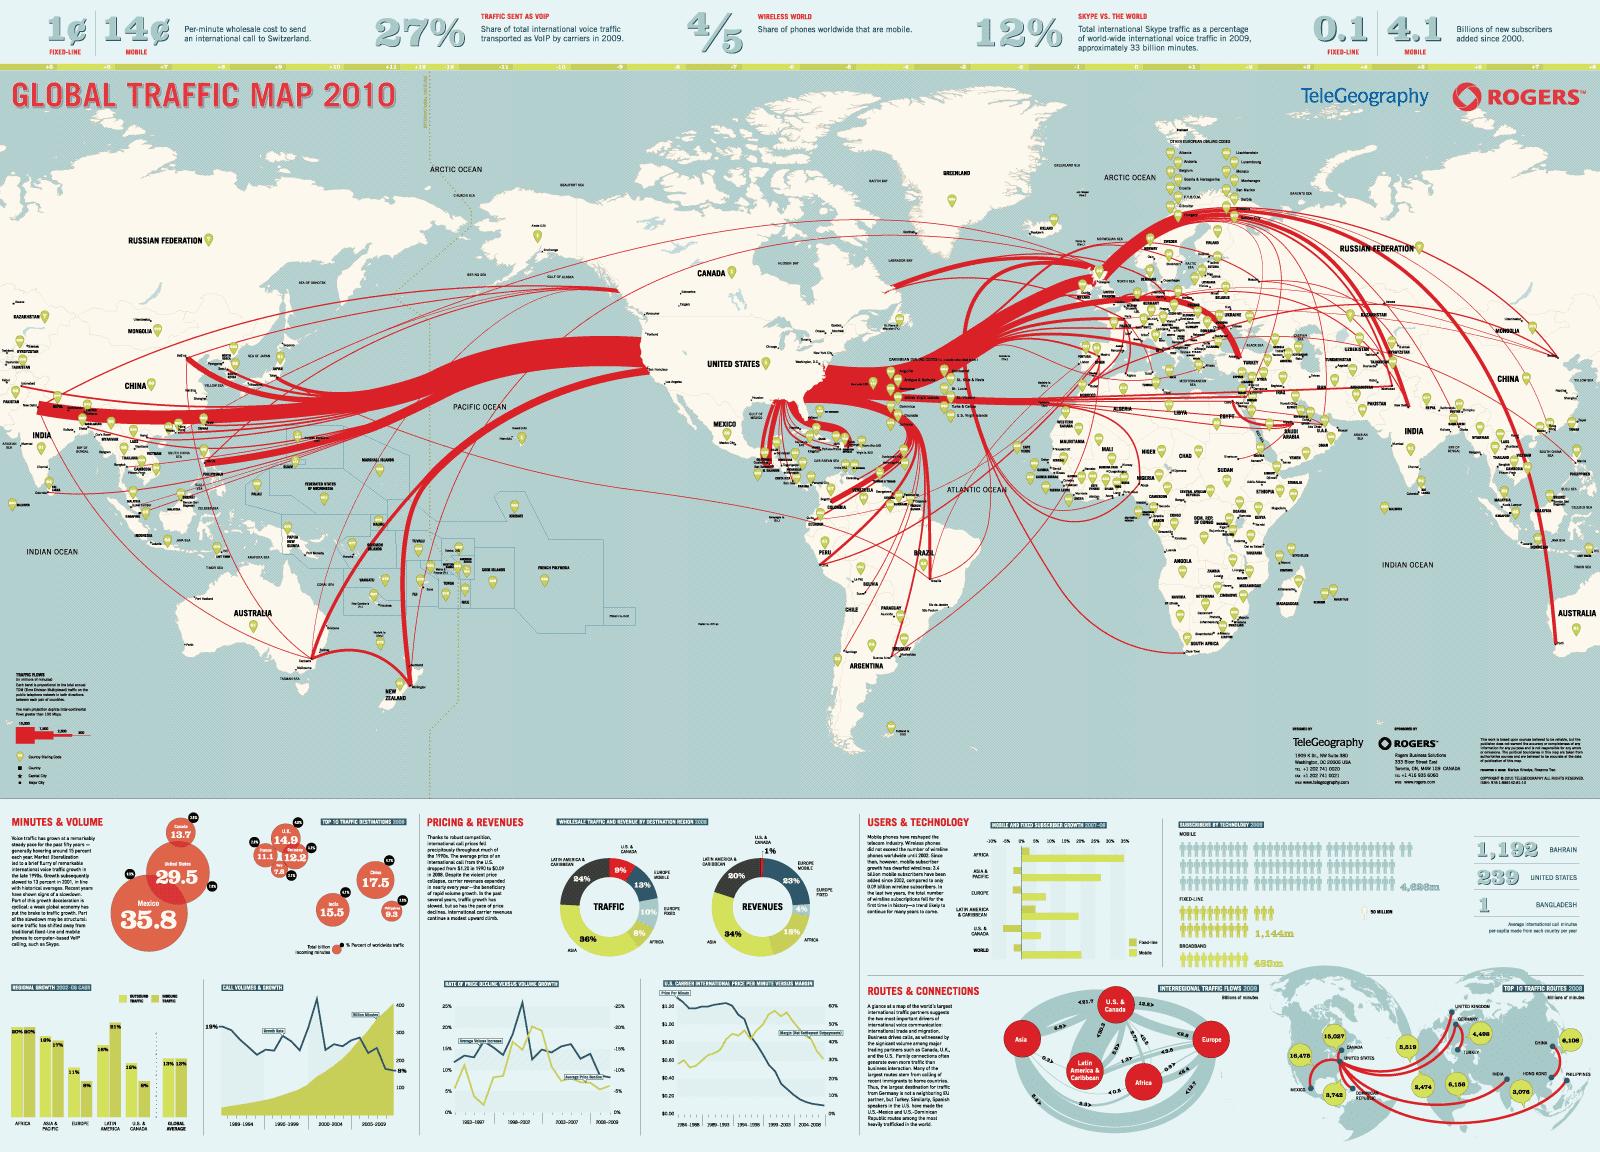 InterNet Global Traffic Map Online Marketing Trends